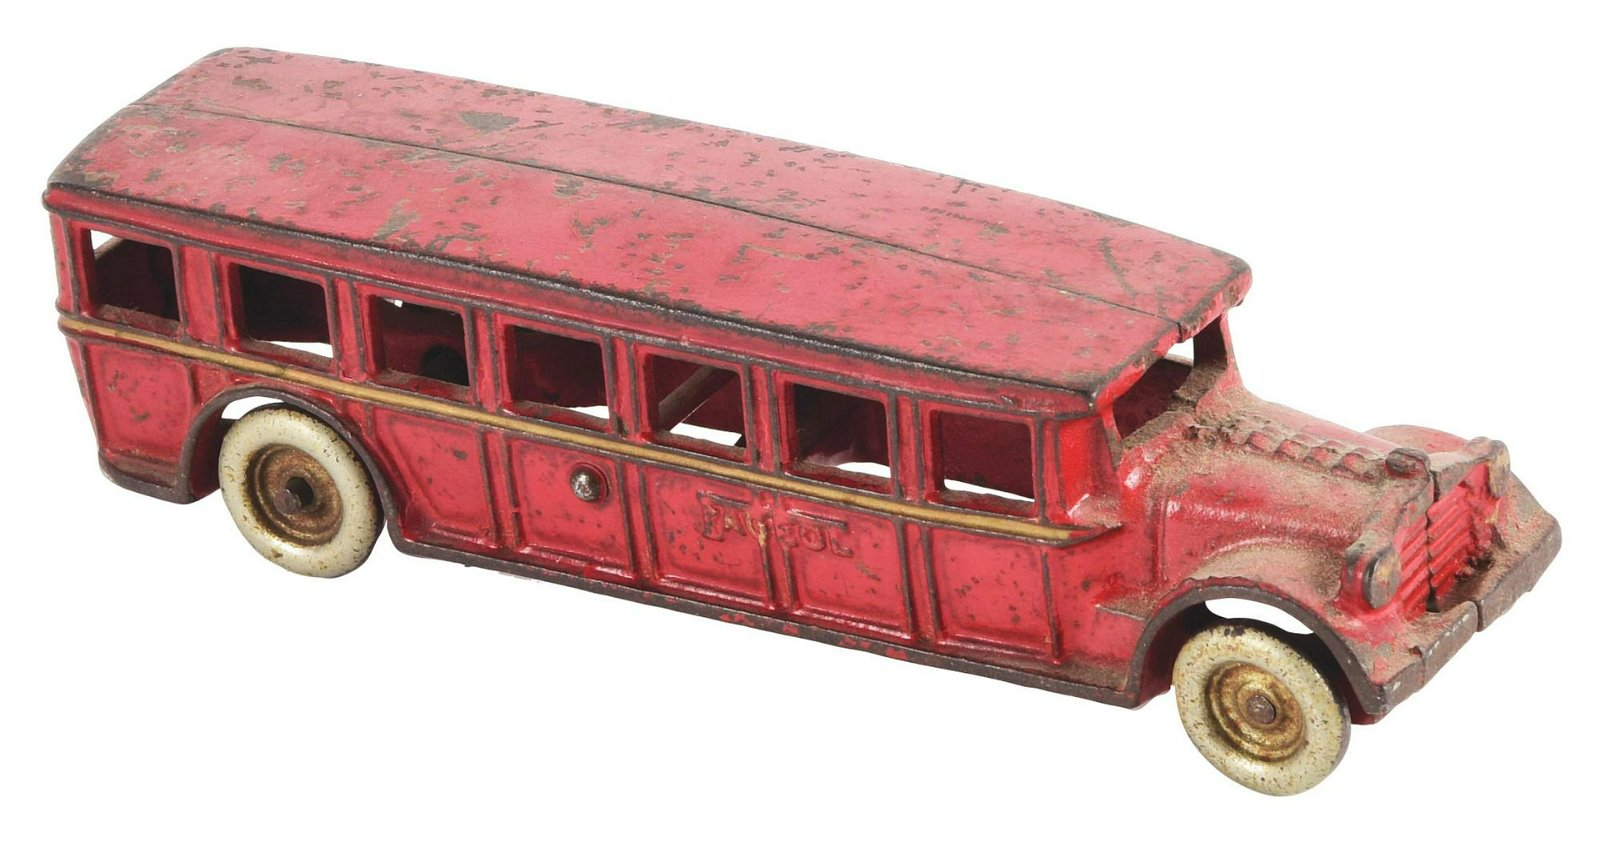 Arcade Small Fageol Bus.